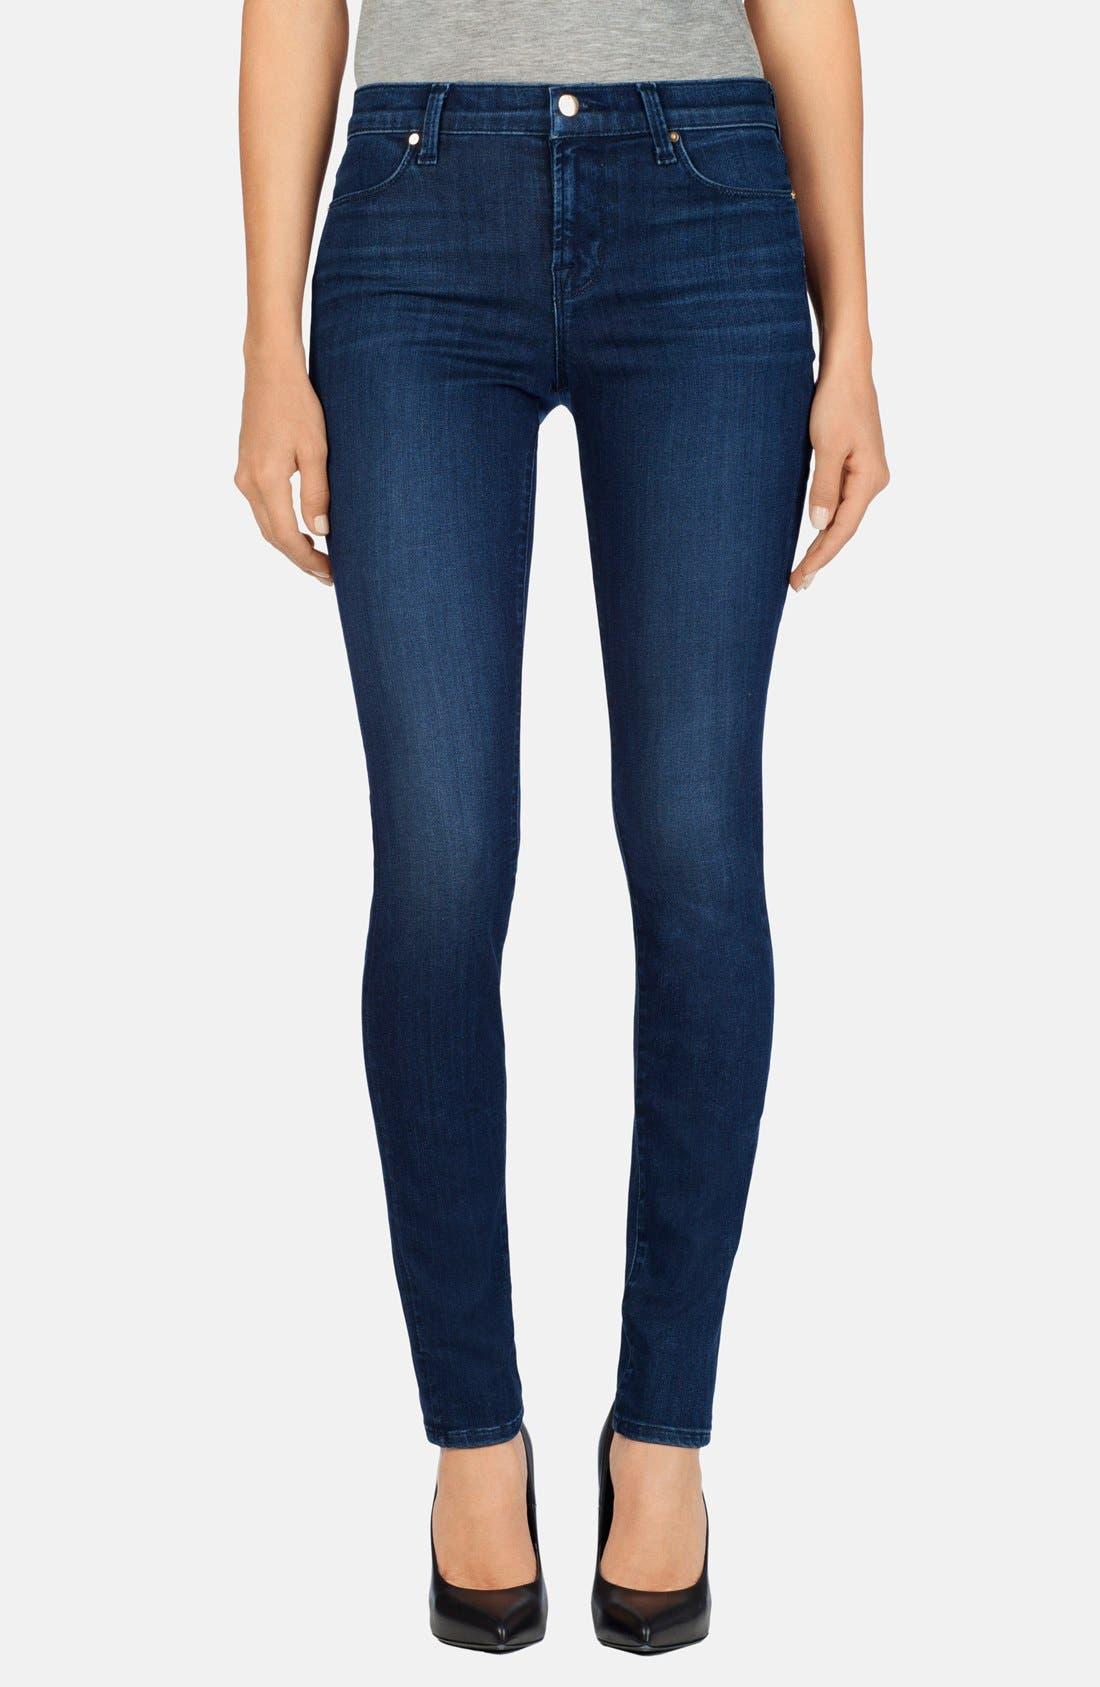 Main Image - J Brand '620' Mid Rise Super Skinny Jeans (Fix)